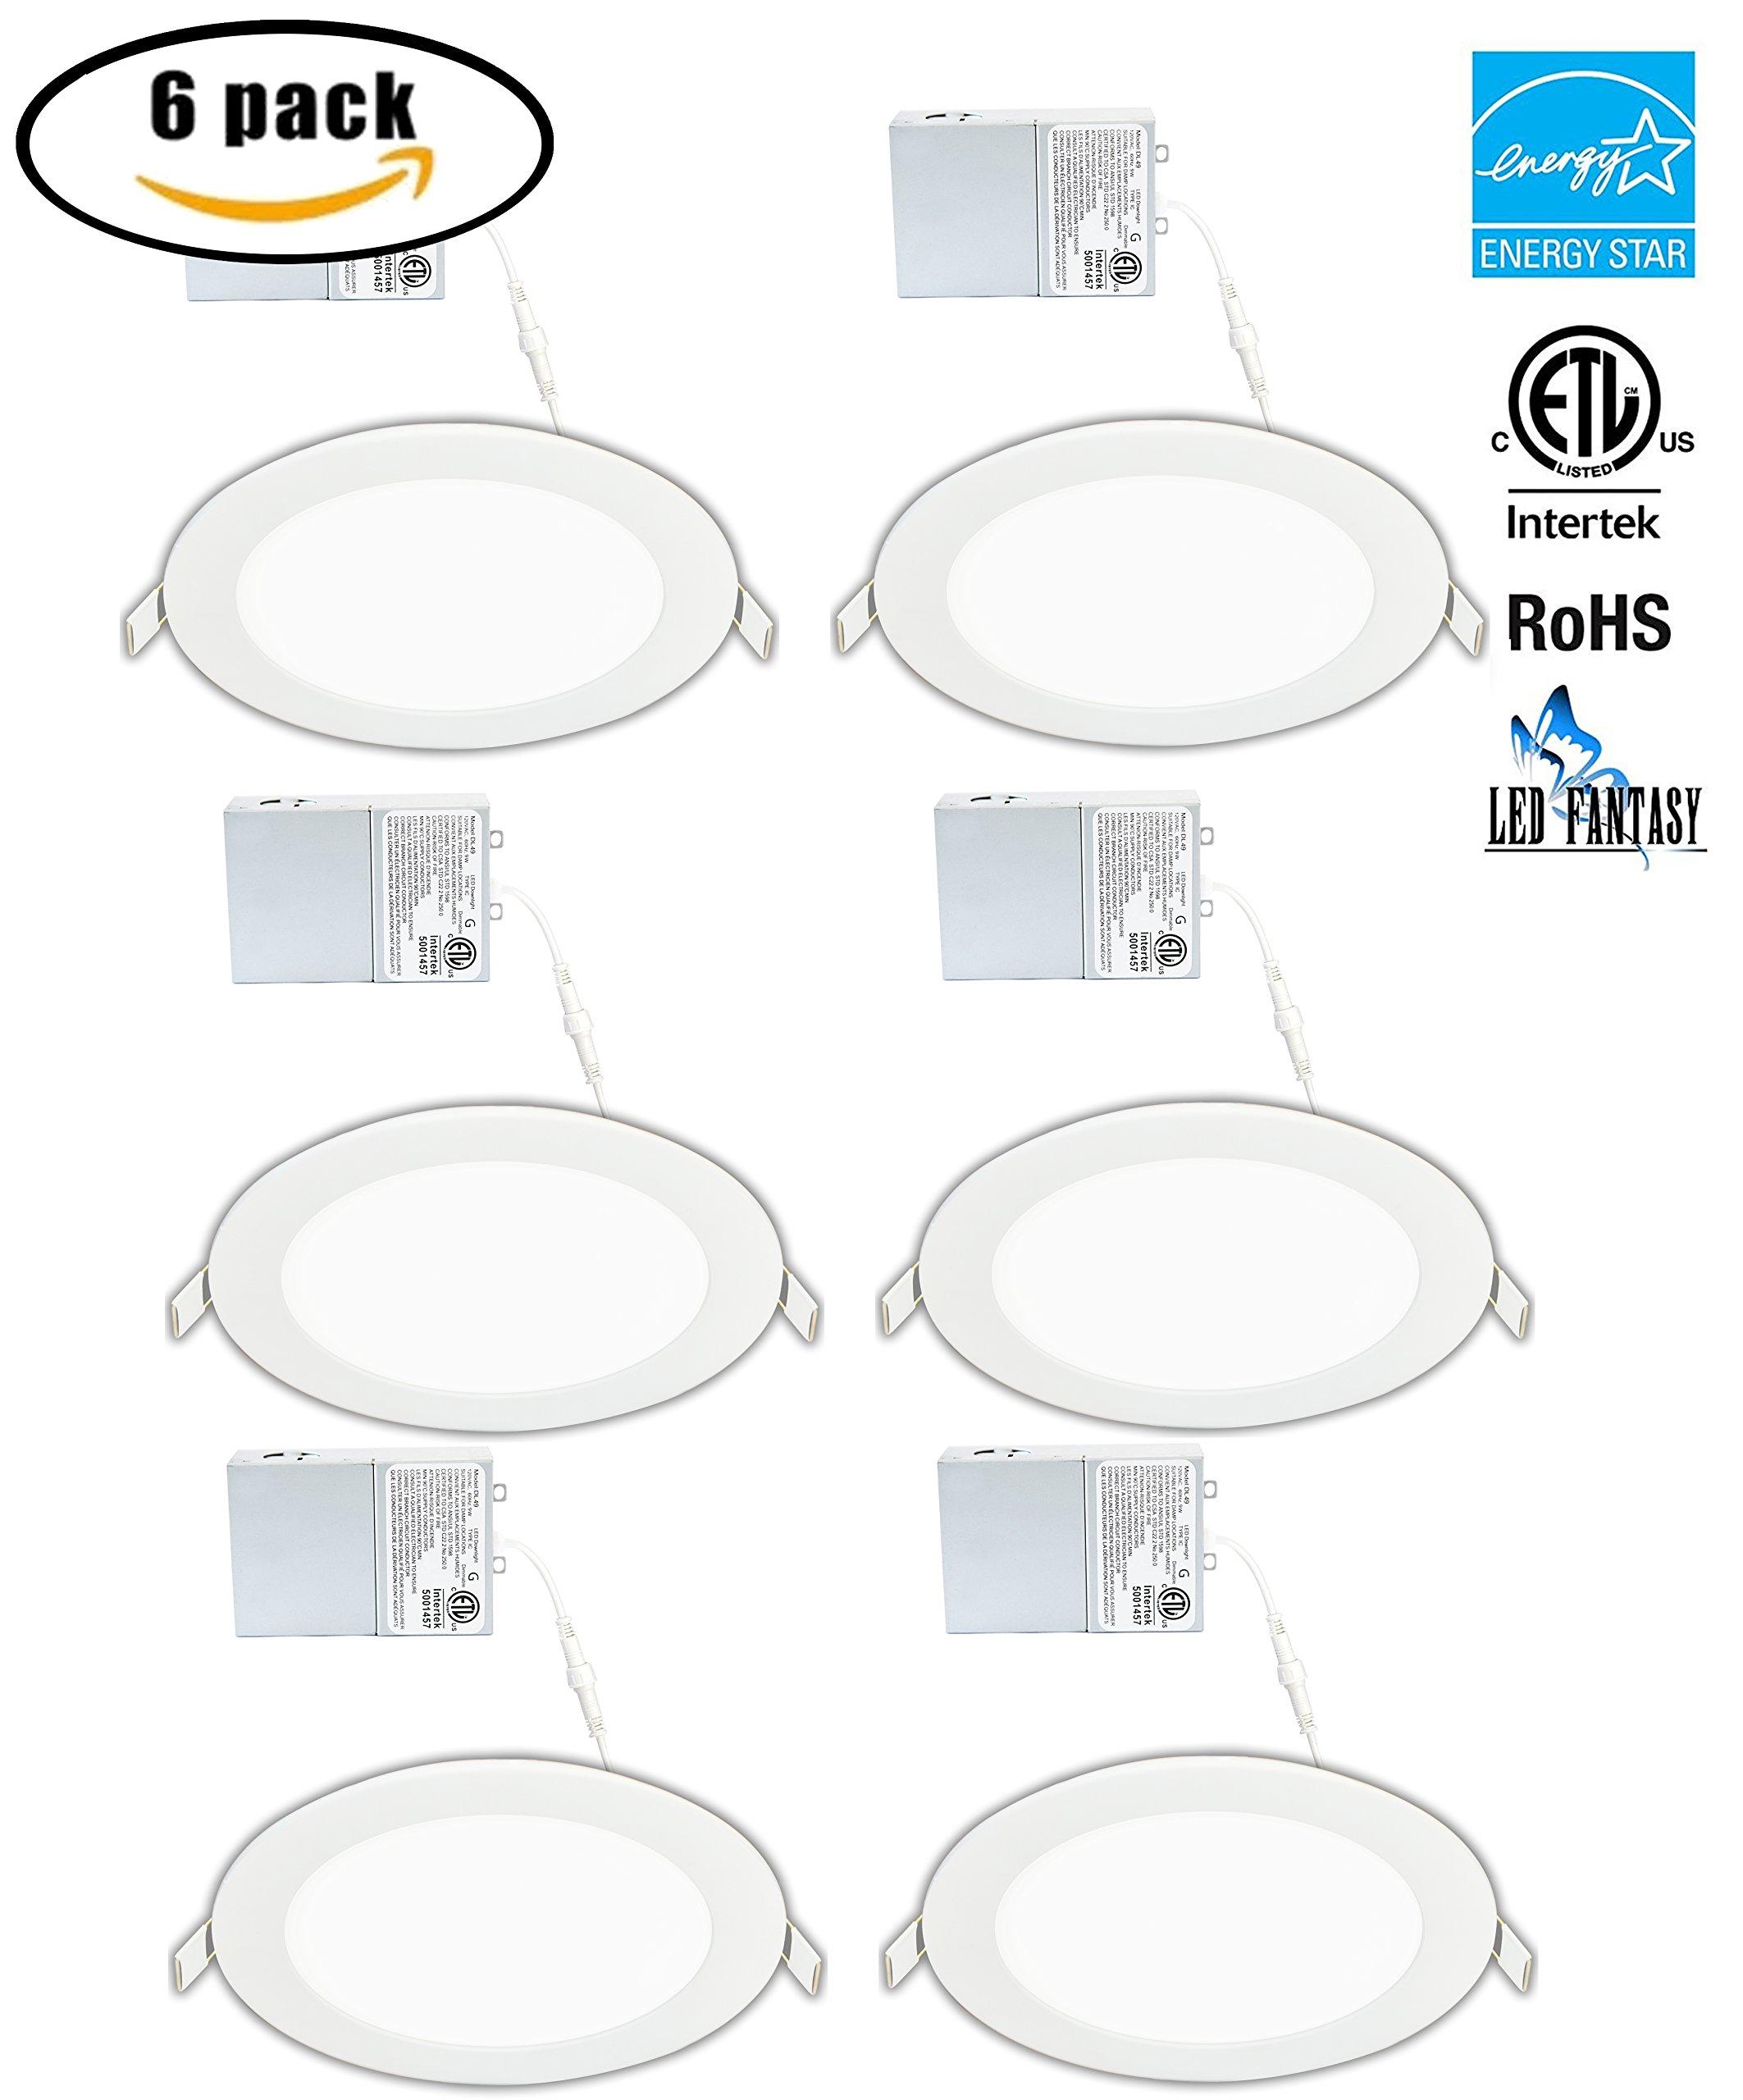 LED FANTASY 6-Inch 15W 120V Recessed Ultra Thin Ceiling LED Light Retrofit Downlight Wafer Panel Slim IC Rated ETL Energy Star 1000 Lumens (Daylight 5000k, 6 pack)